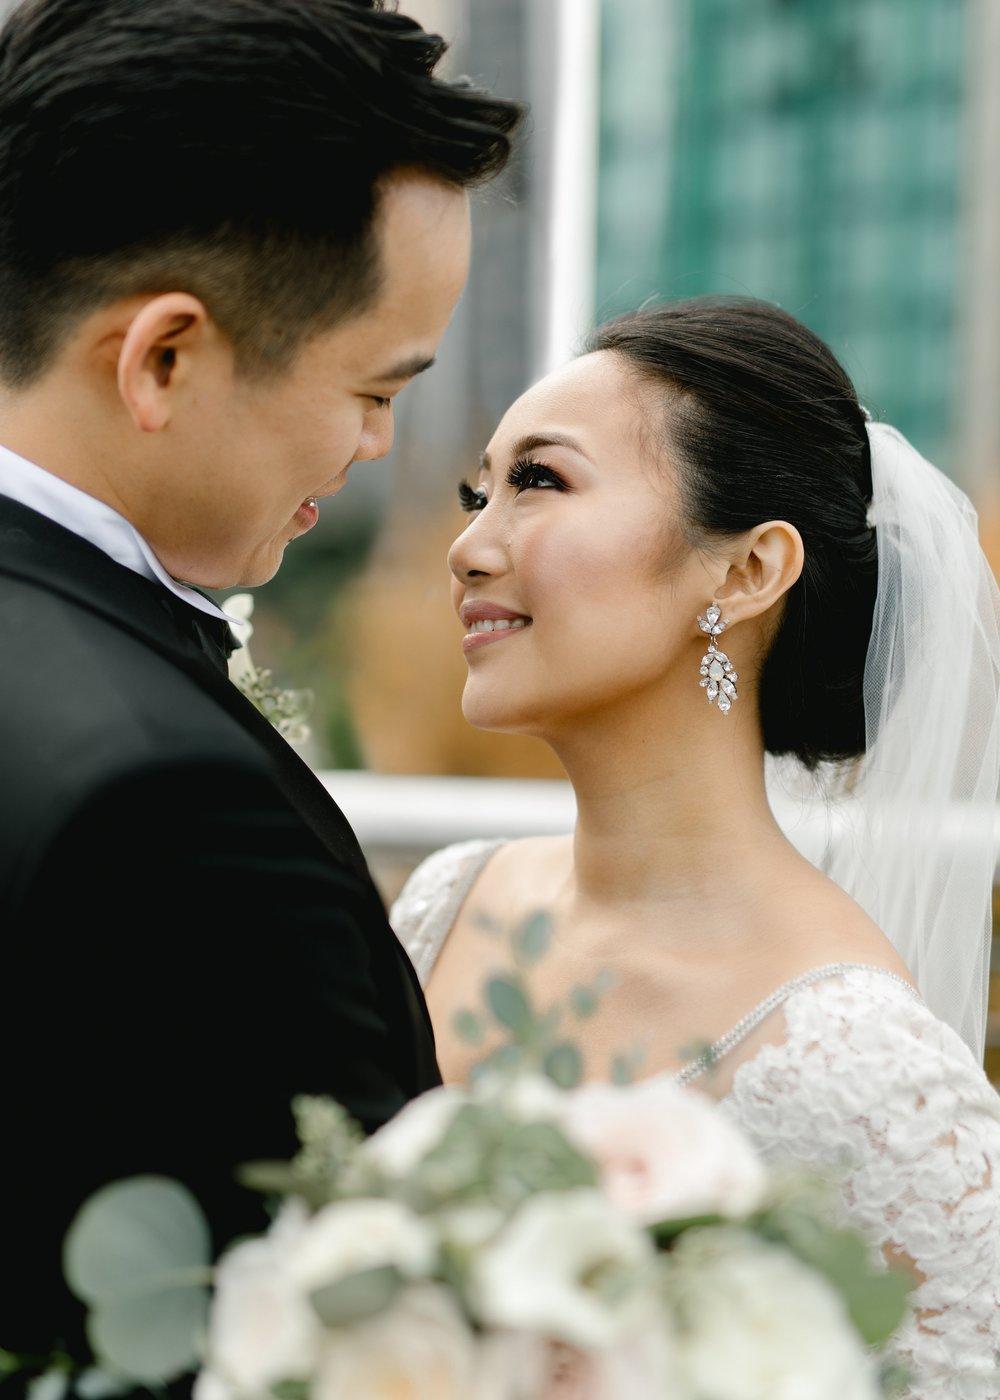 herastudios_wedding_carmen_jayjay_hera_selects-48.jpg